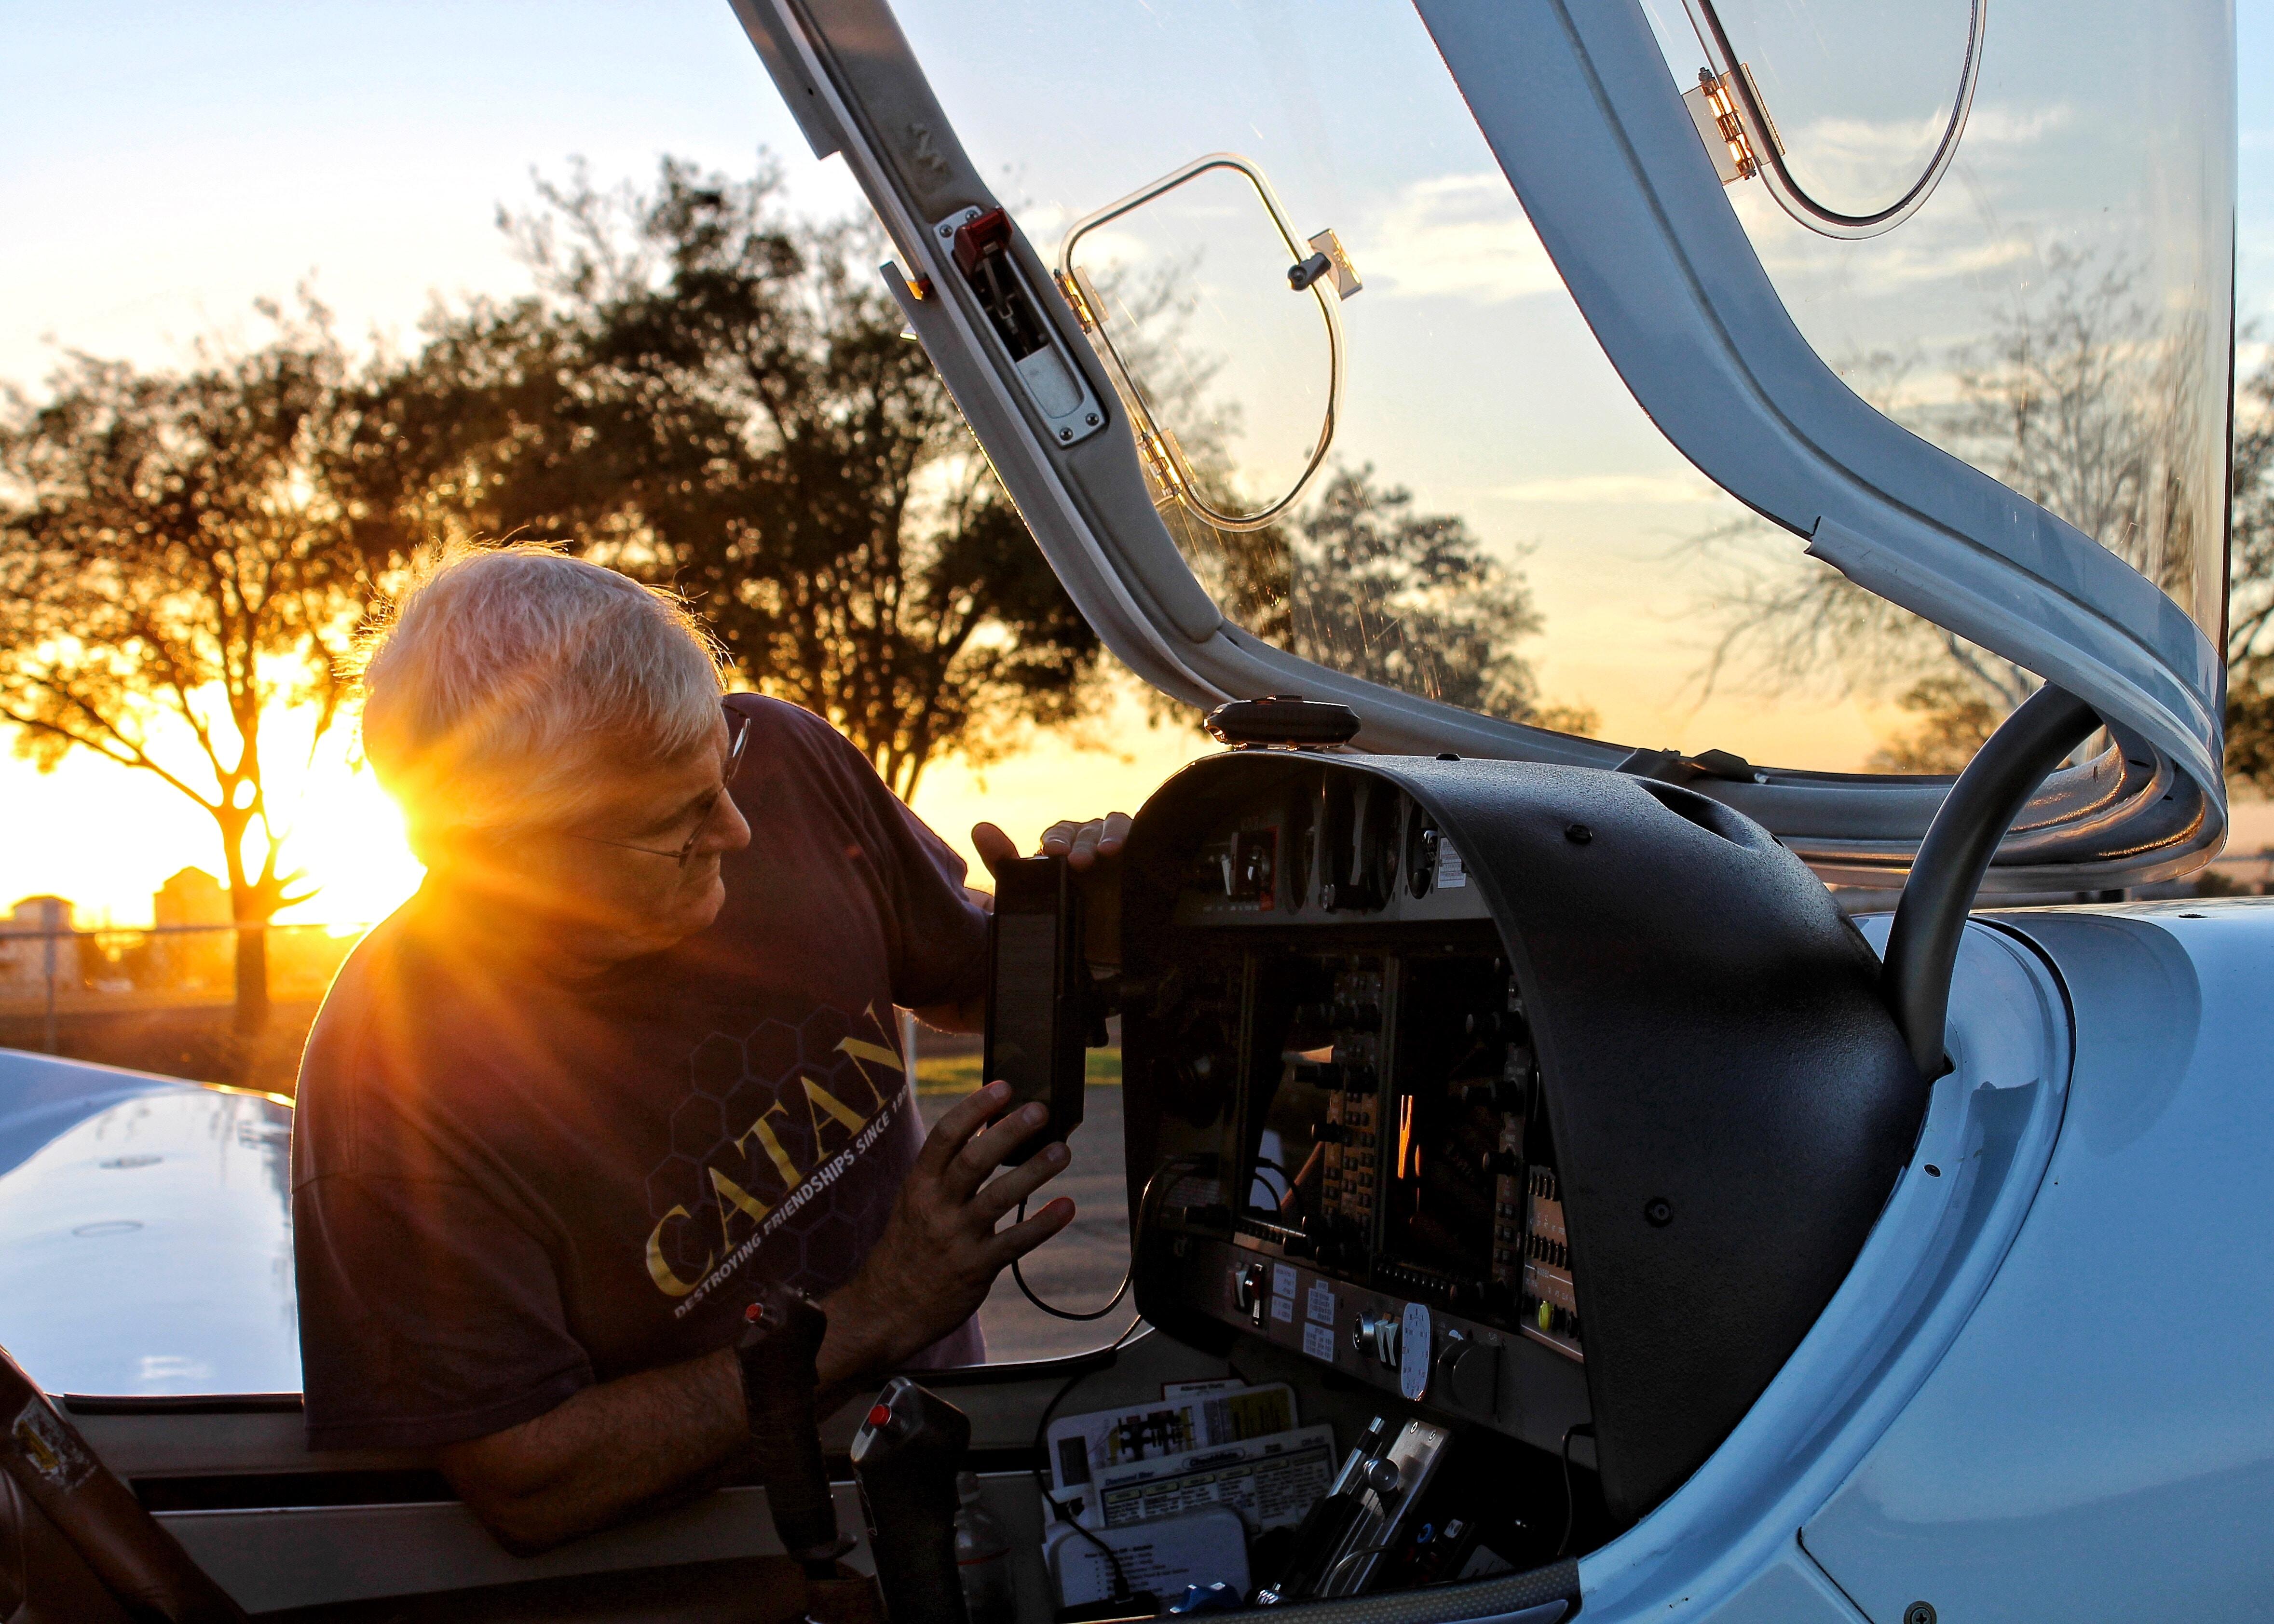 man holding car's side mirror during daytime